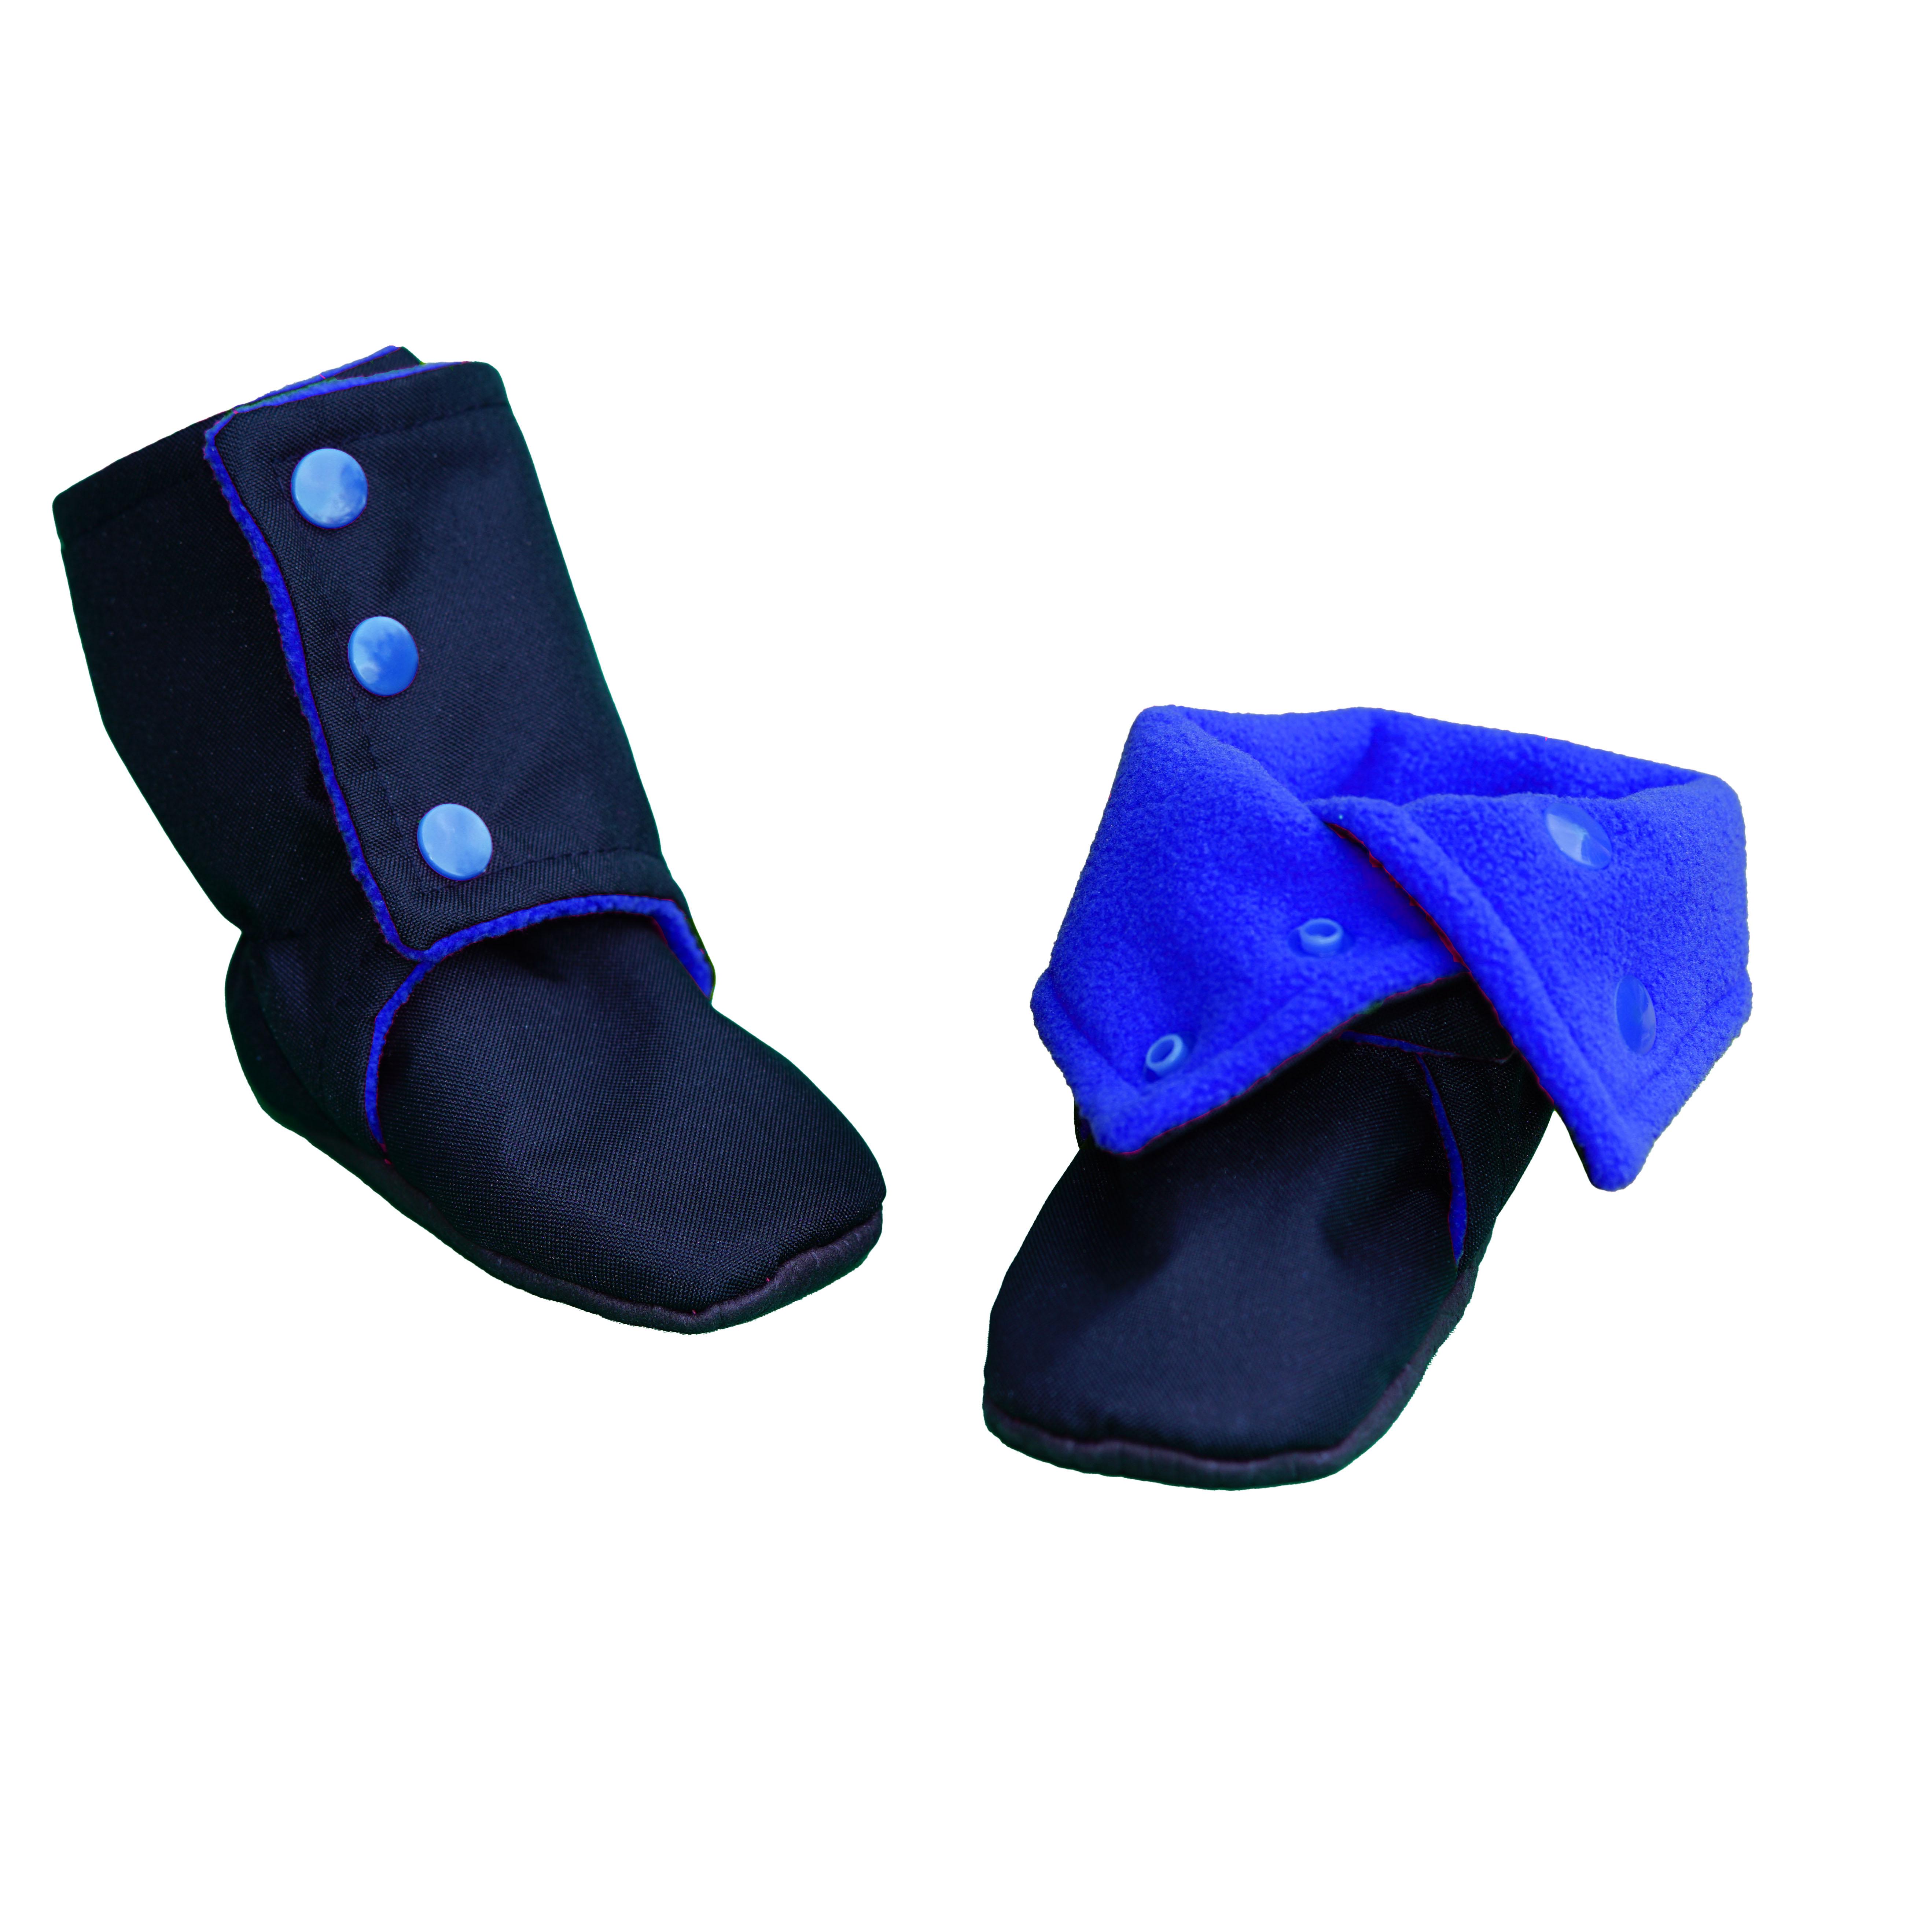 Botosei -  Negru/Albastru 4